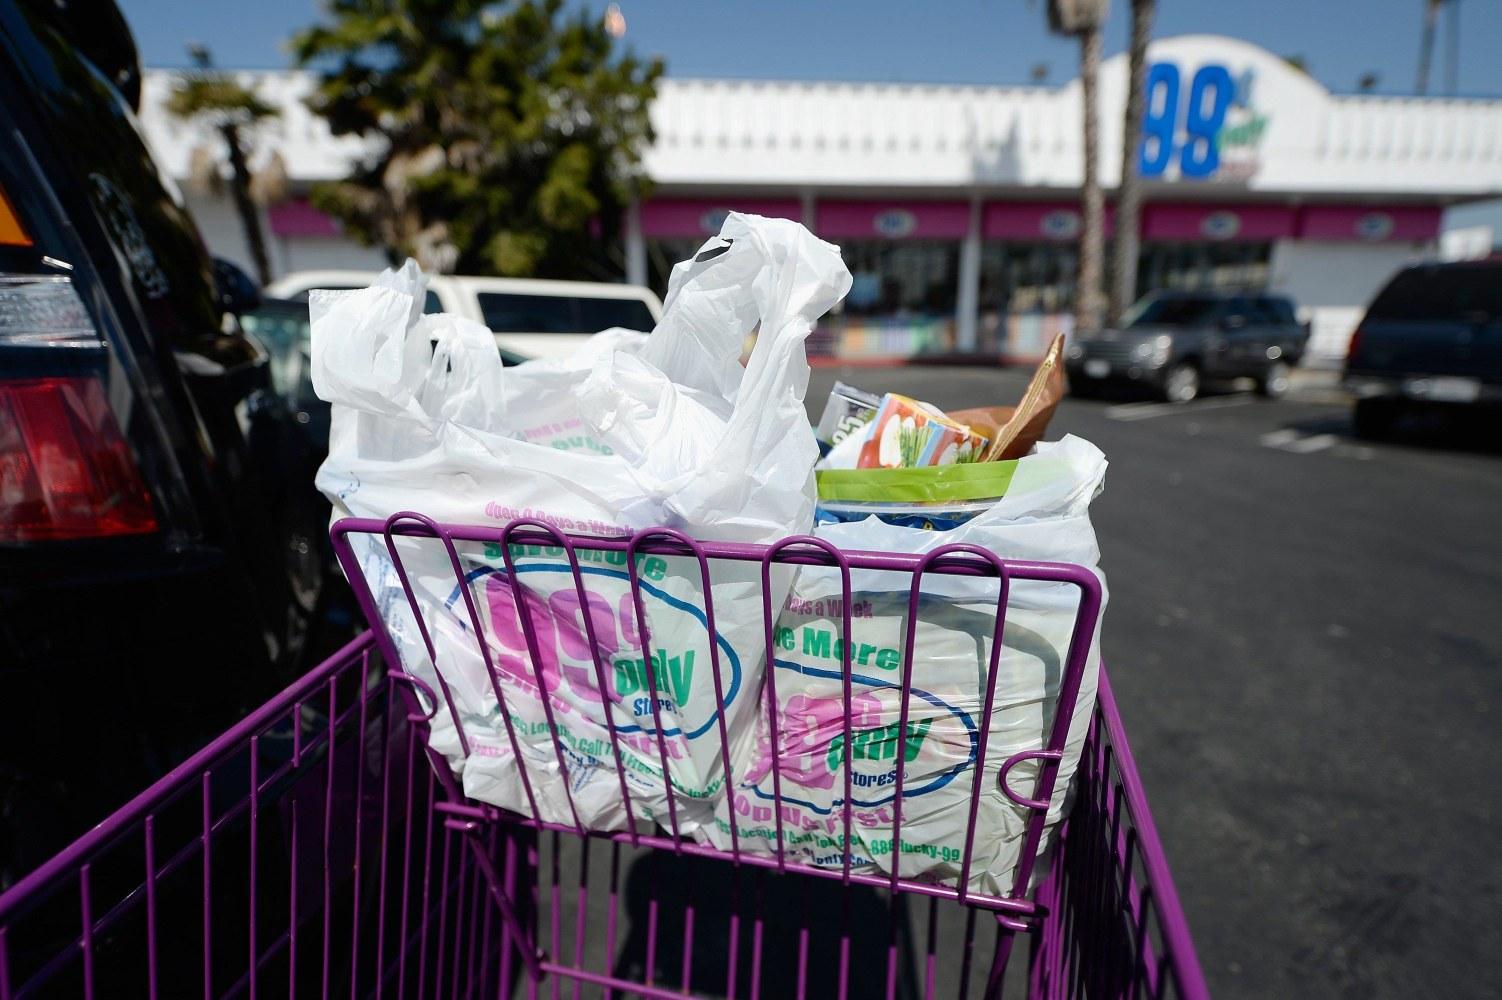 Plastic bag ban chicago - Image Los Angeles City Council Votes On Plastic Bag Ban